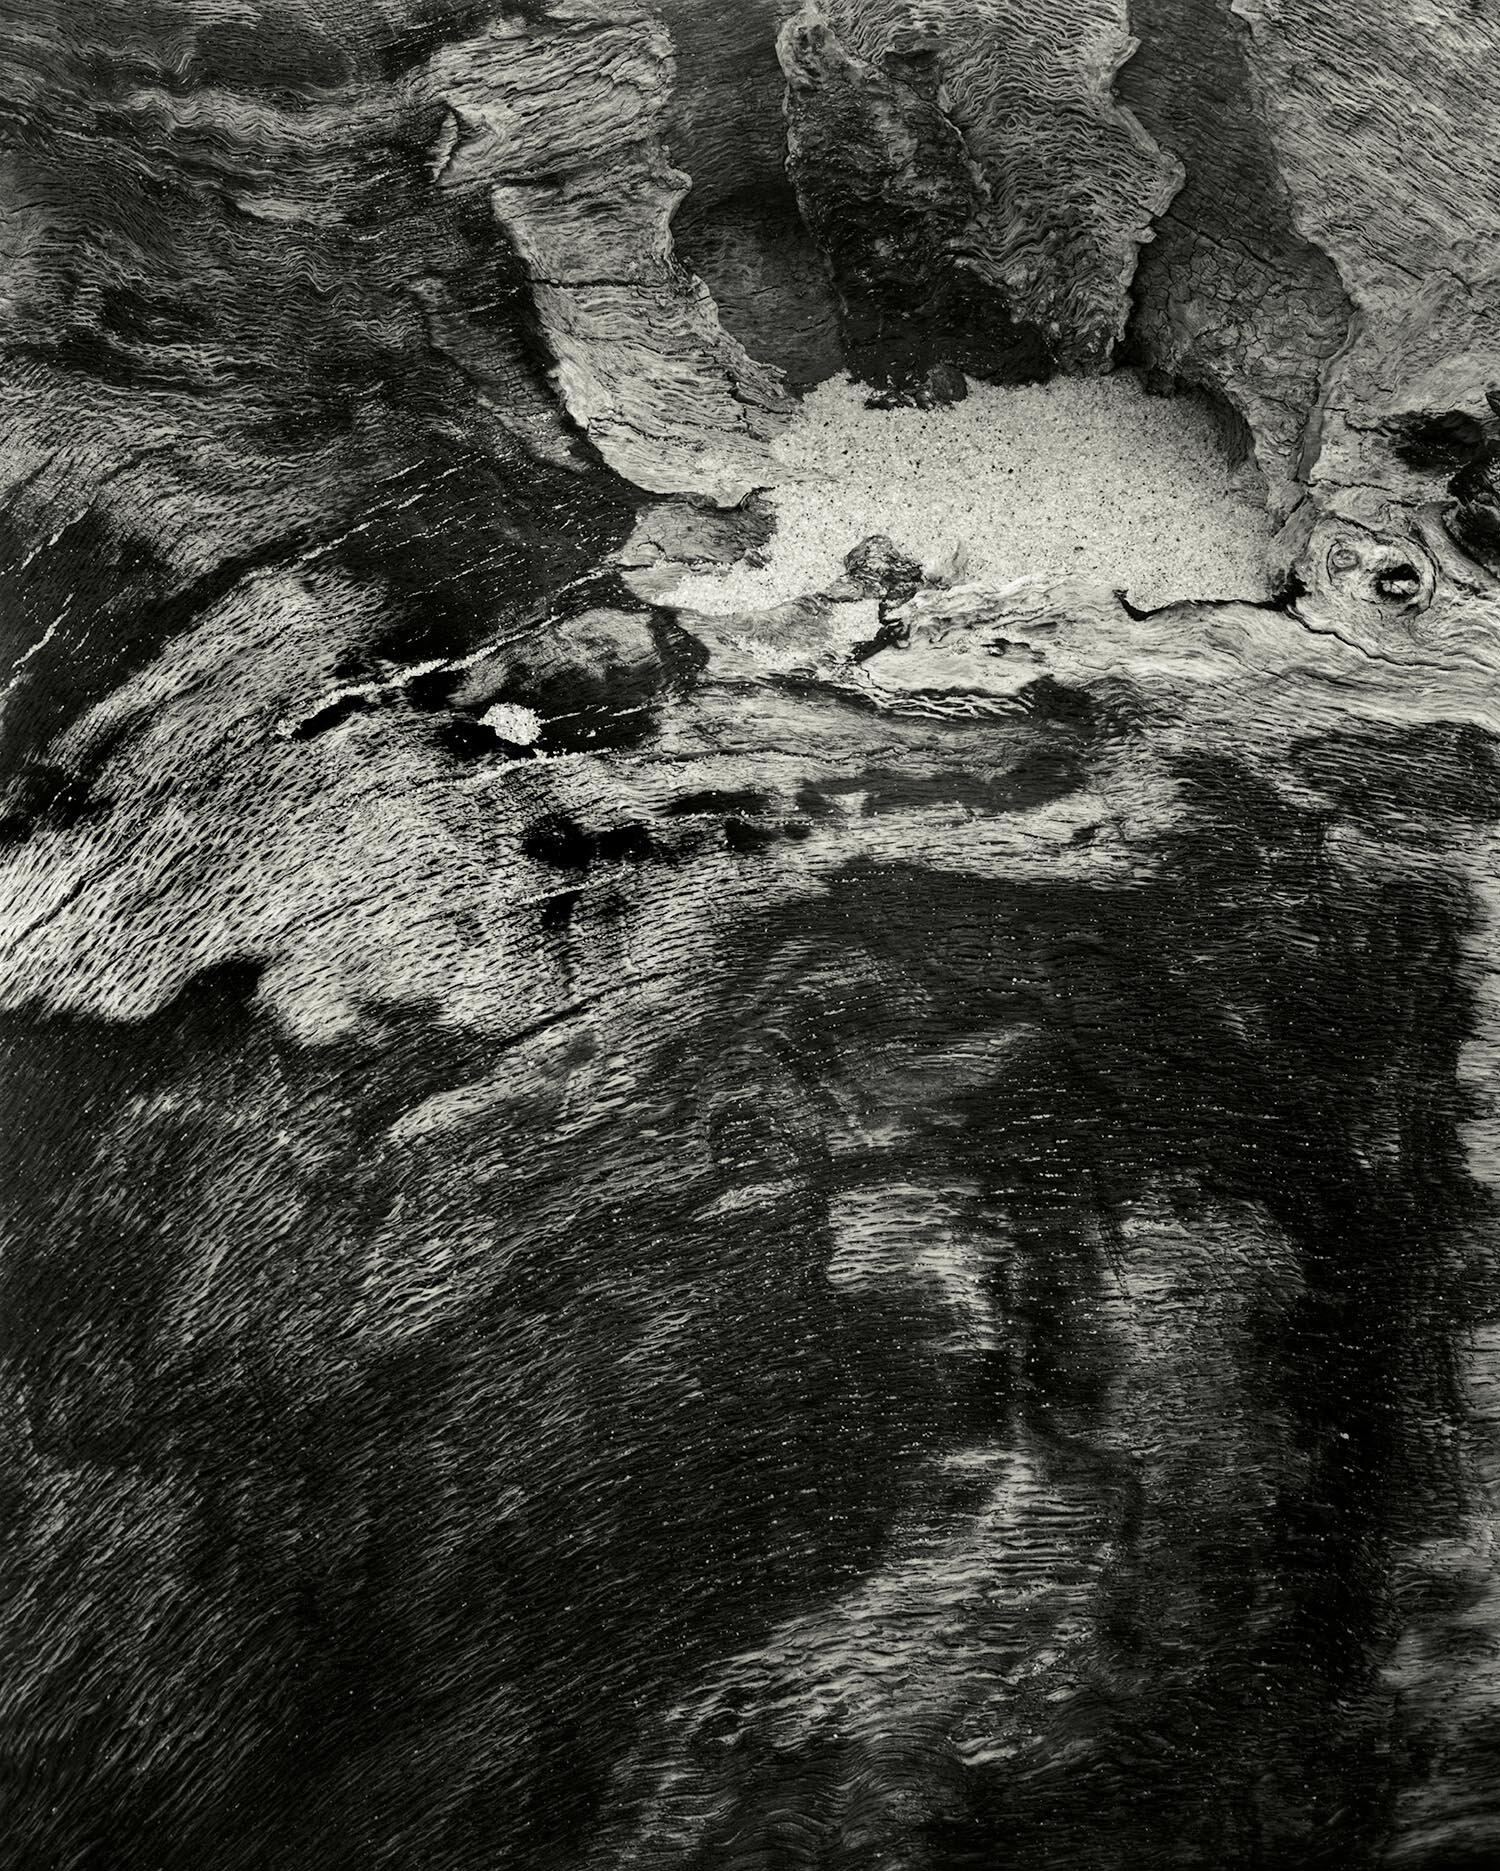 Charred Driftwood, CedarPoint Beach, Long Island, 1976